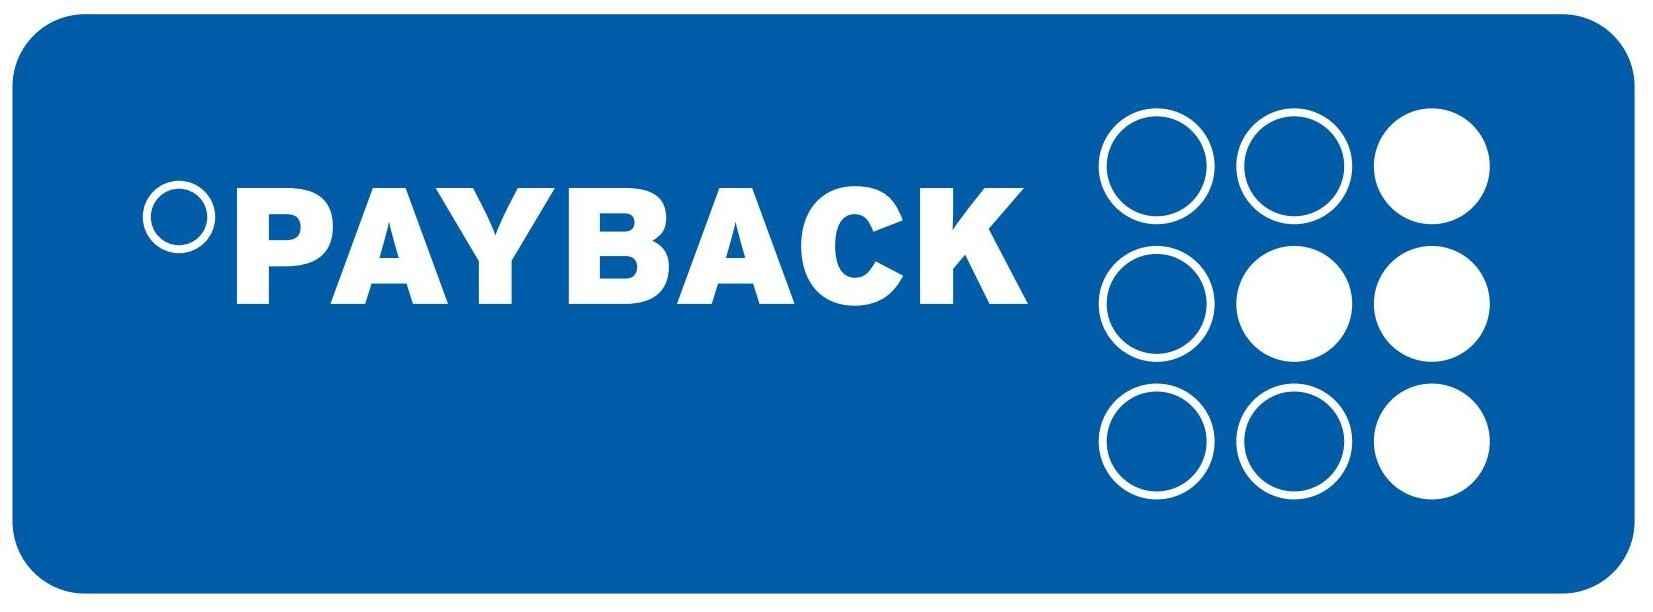 Payback Logo [PDF] png